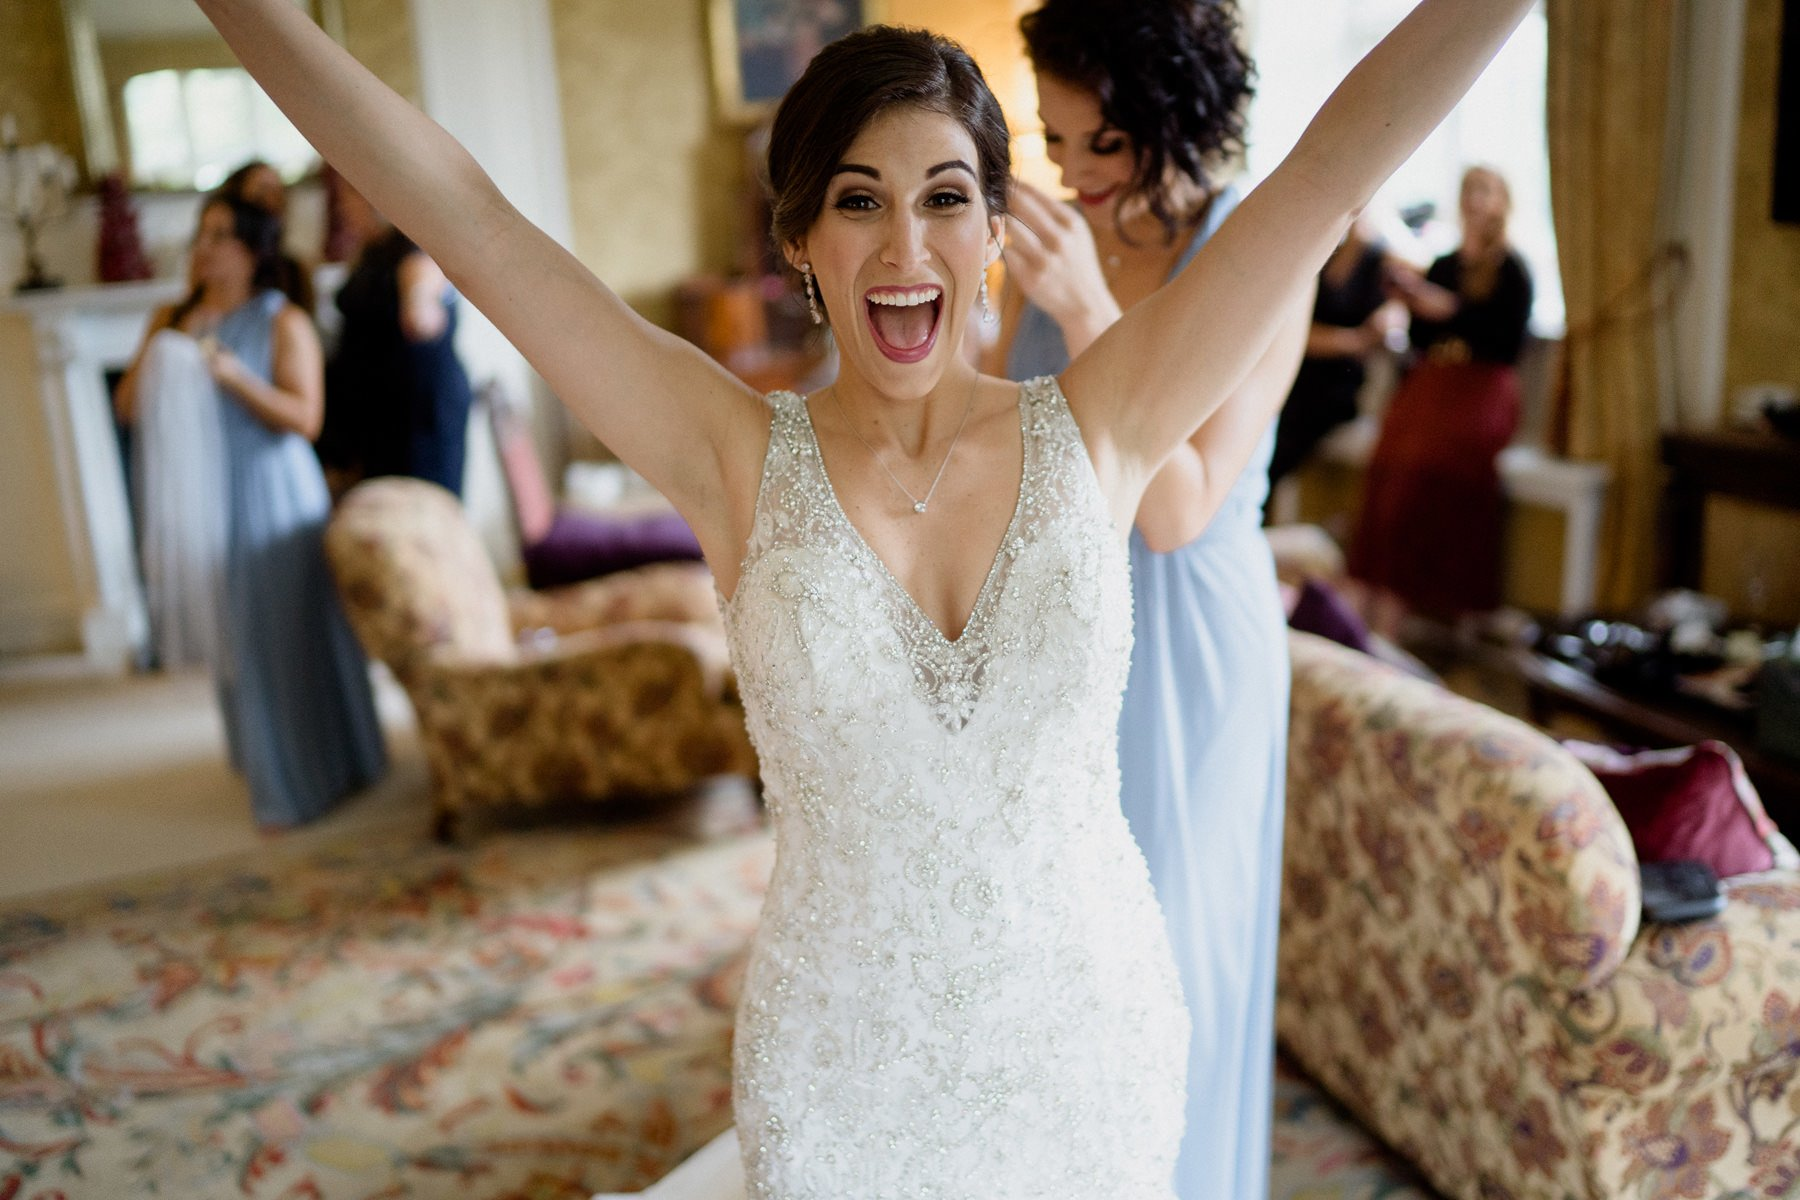 waterford-castle-wedding-bride-getting-ready